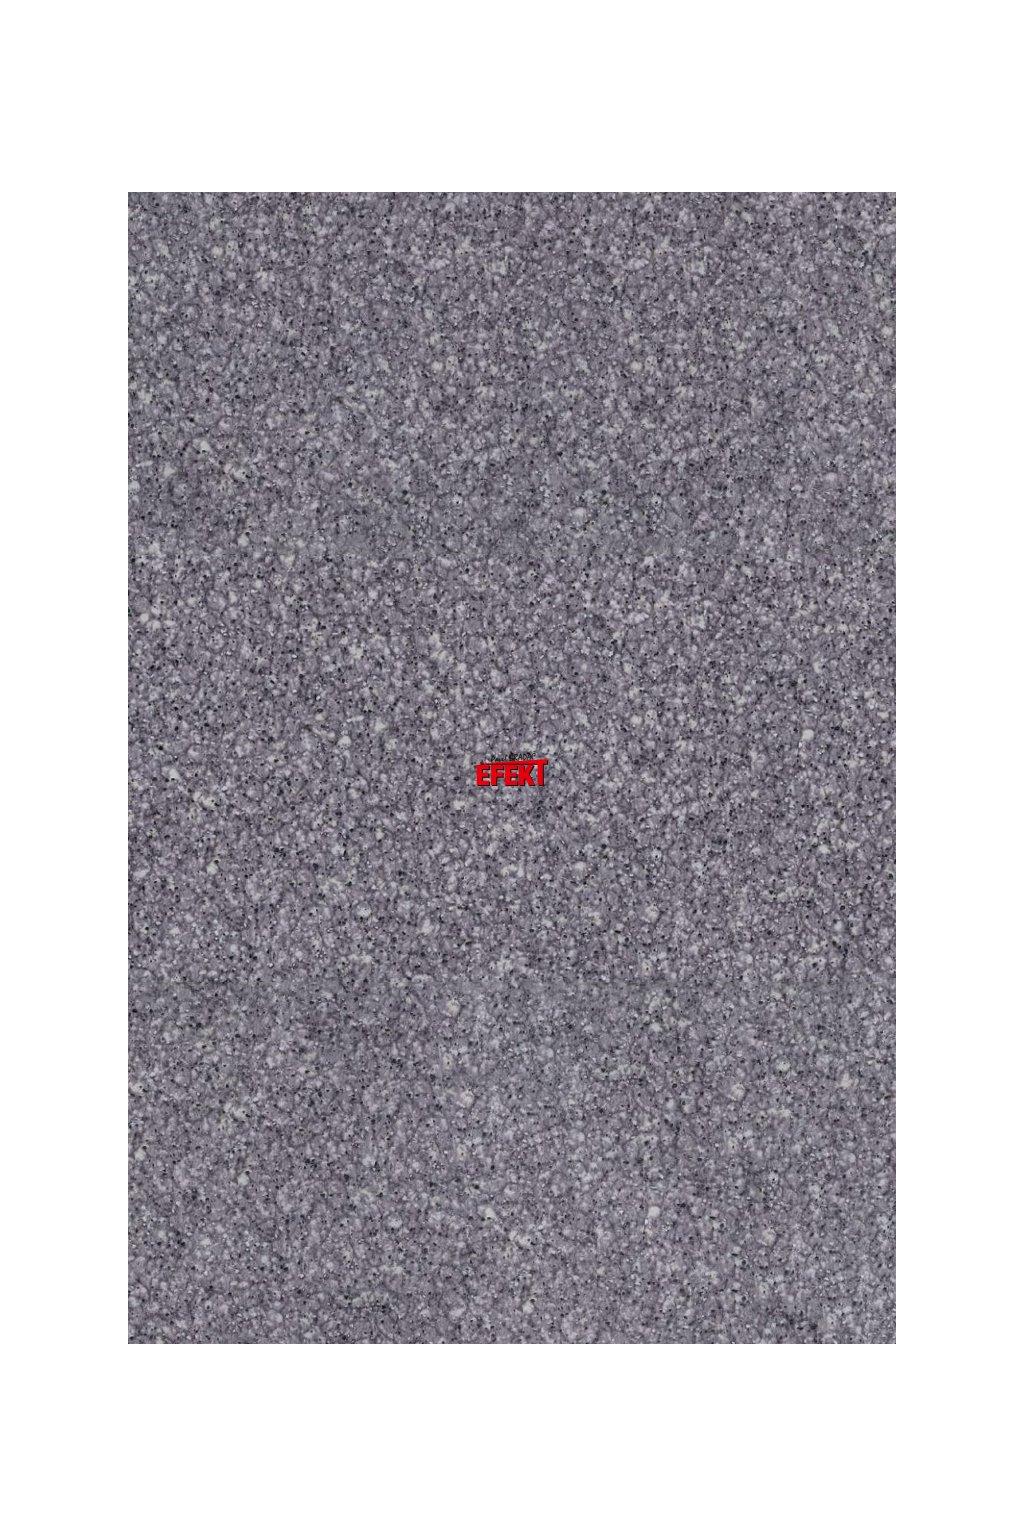 Pixel Anthracite 0632